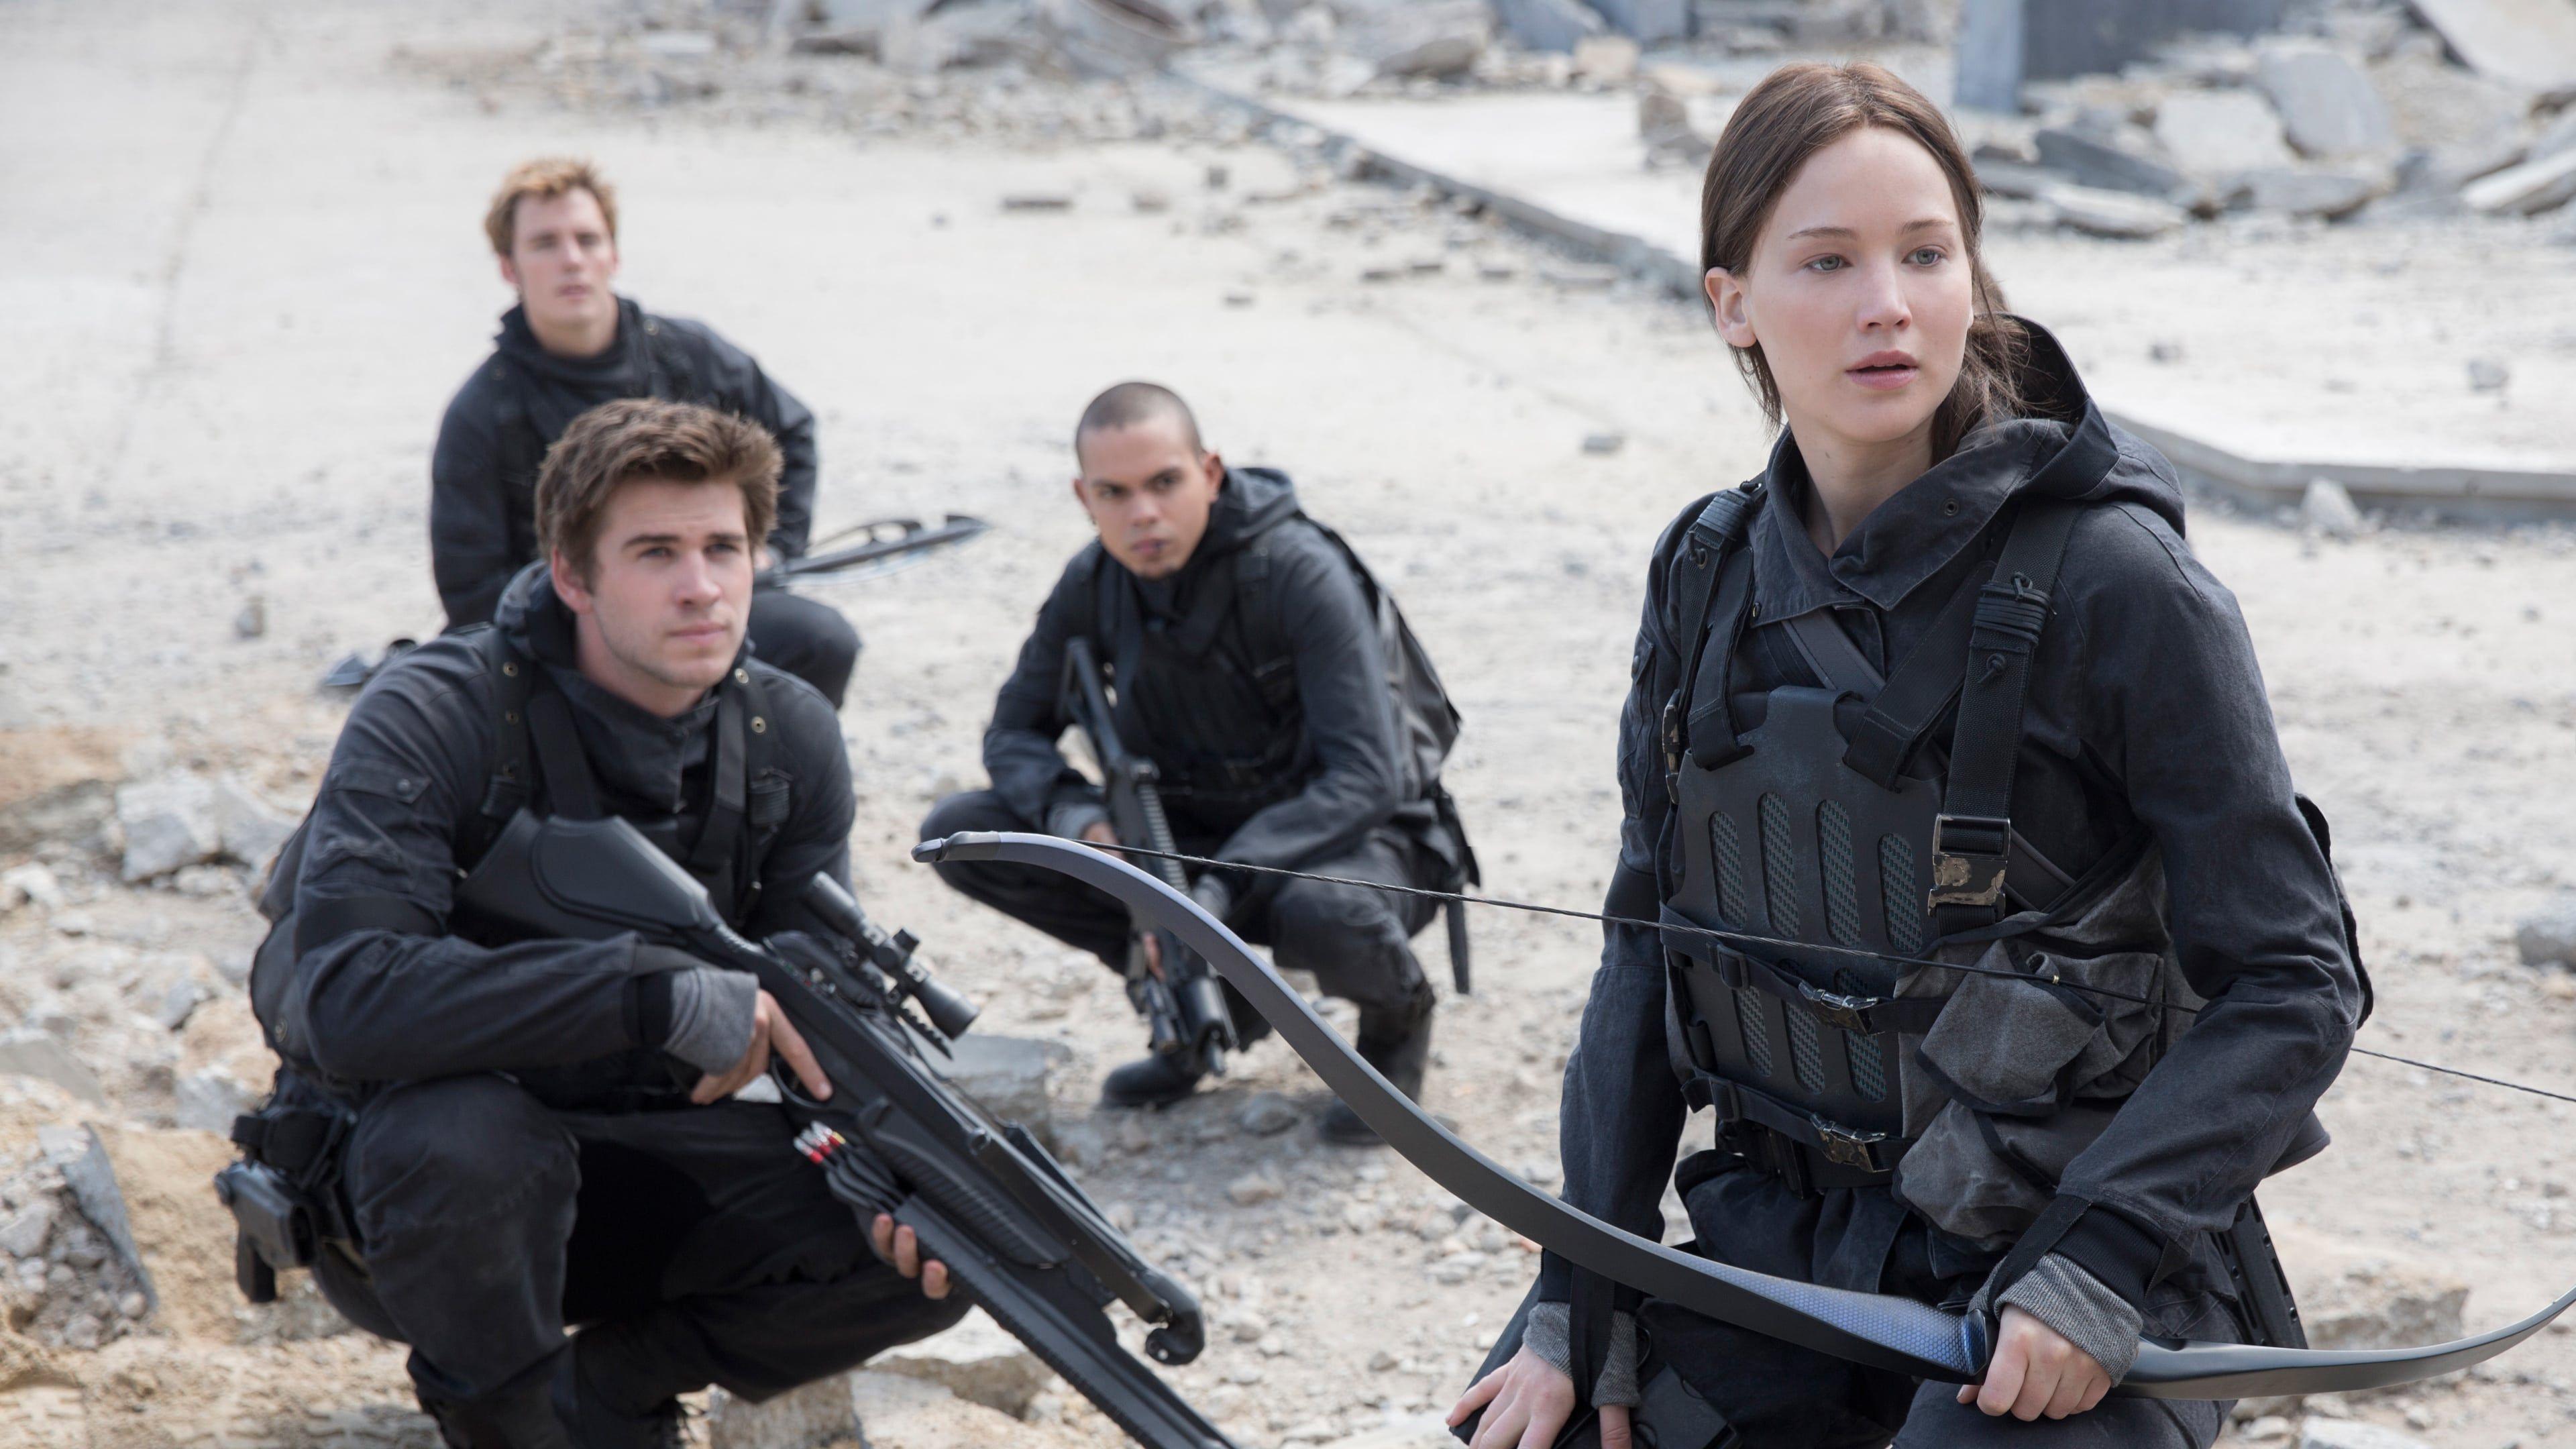 The Hunger Games Mockingjay Del 2 2015 Fuld Film Online Streaming Dansk Movie123 Katniss Everdeen Je Tribute Von Panem Mockingjay Tribute Von Panem Panem